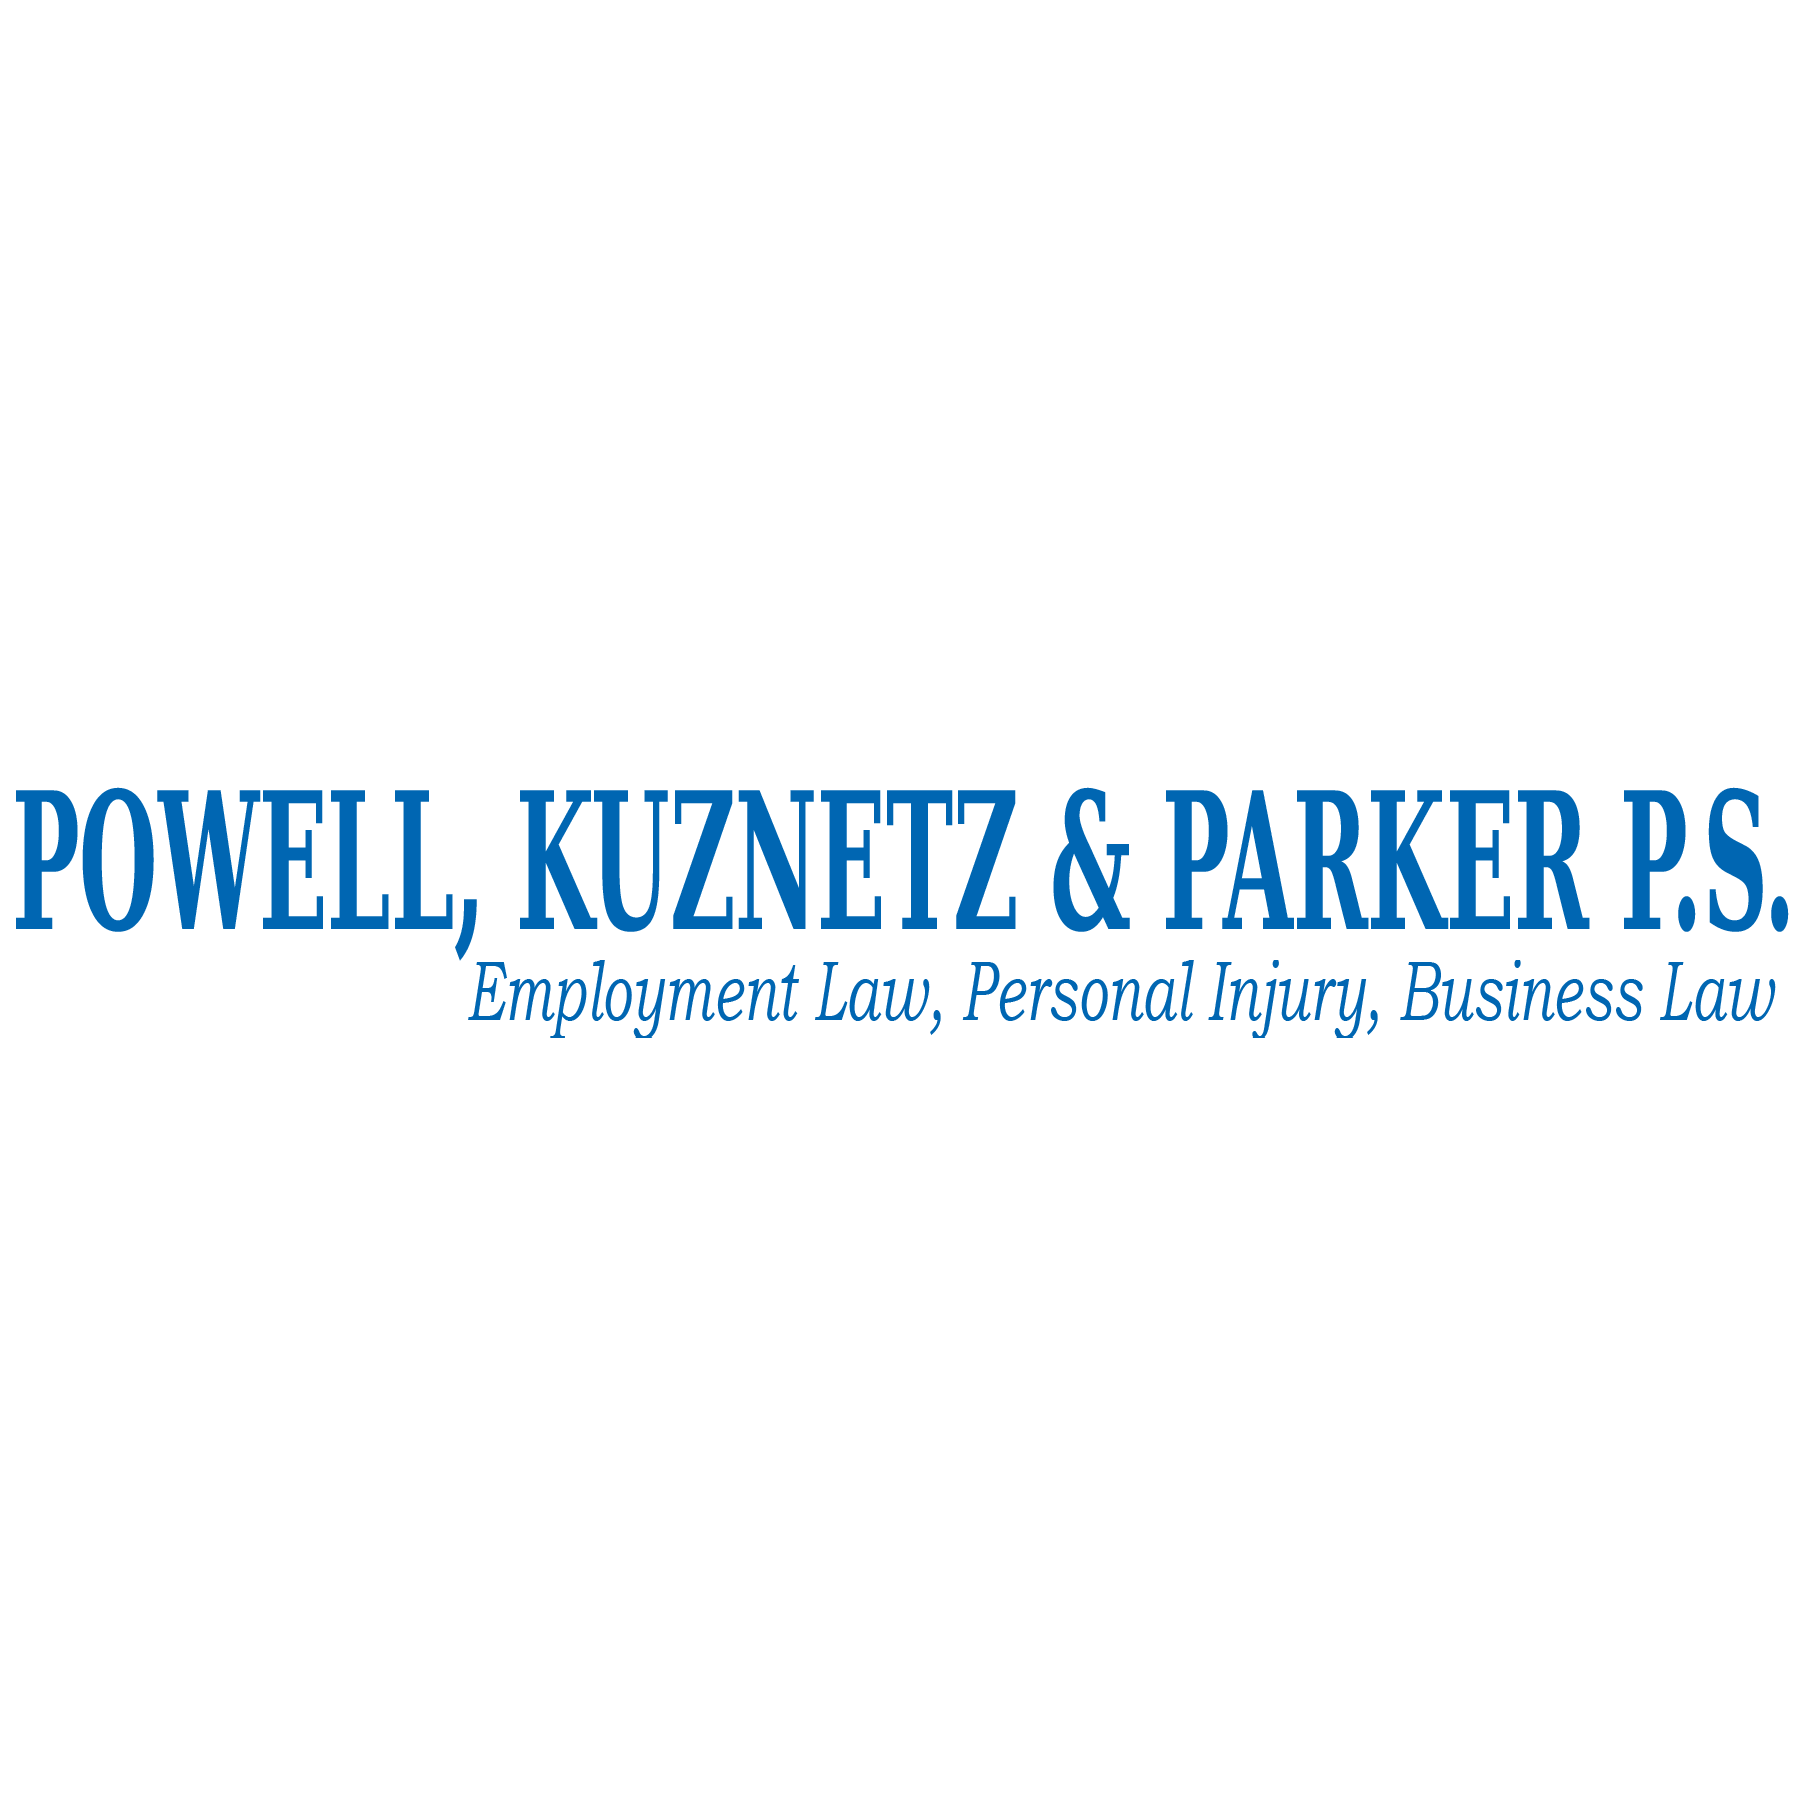 Powell, Kuznetz & Parker P.S.